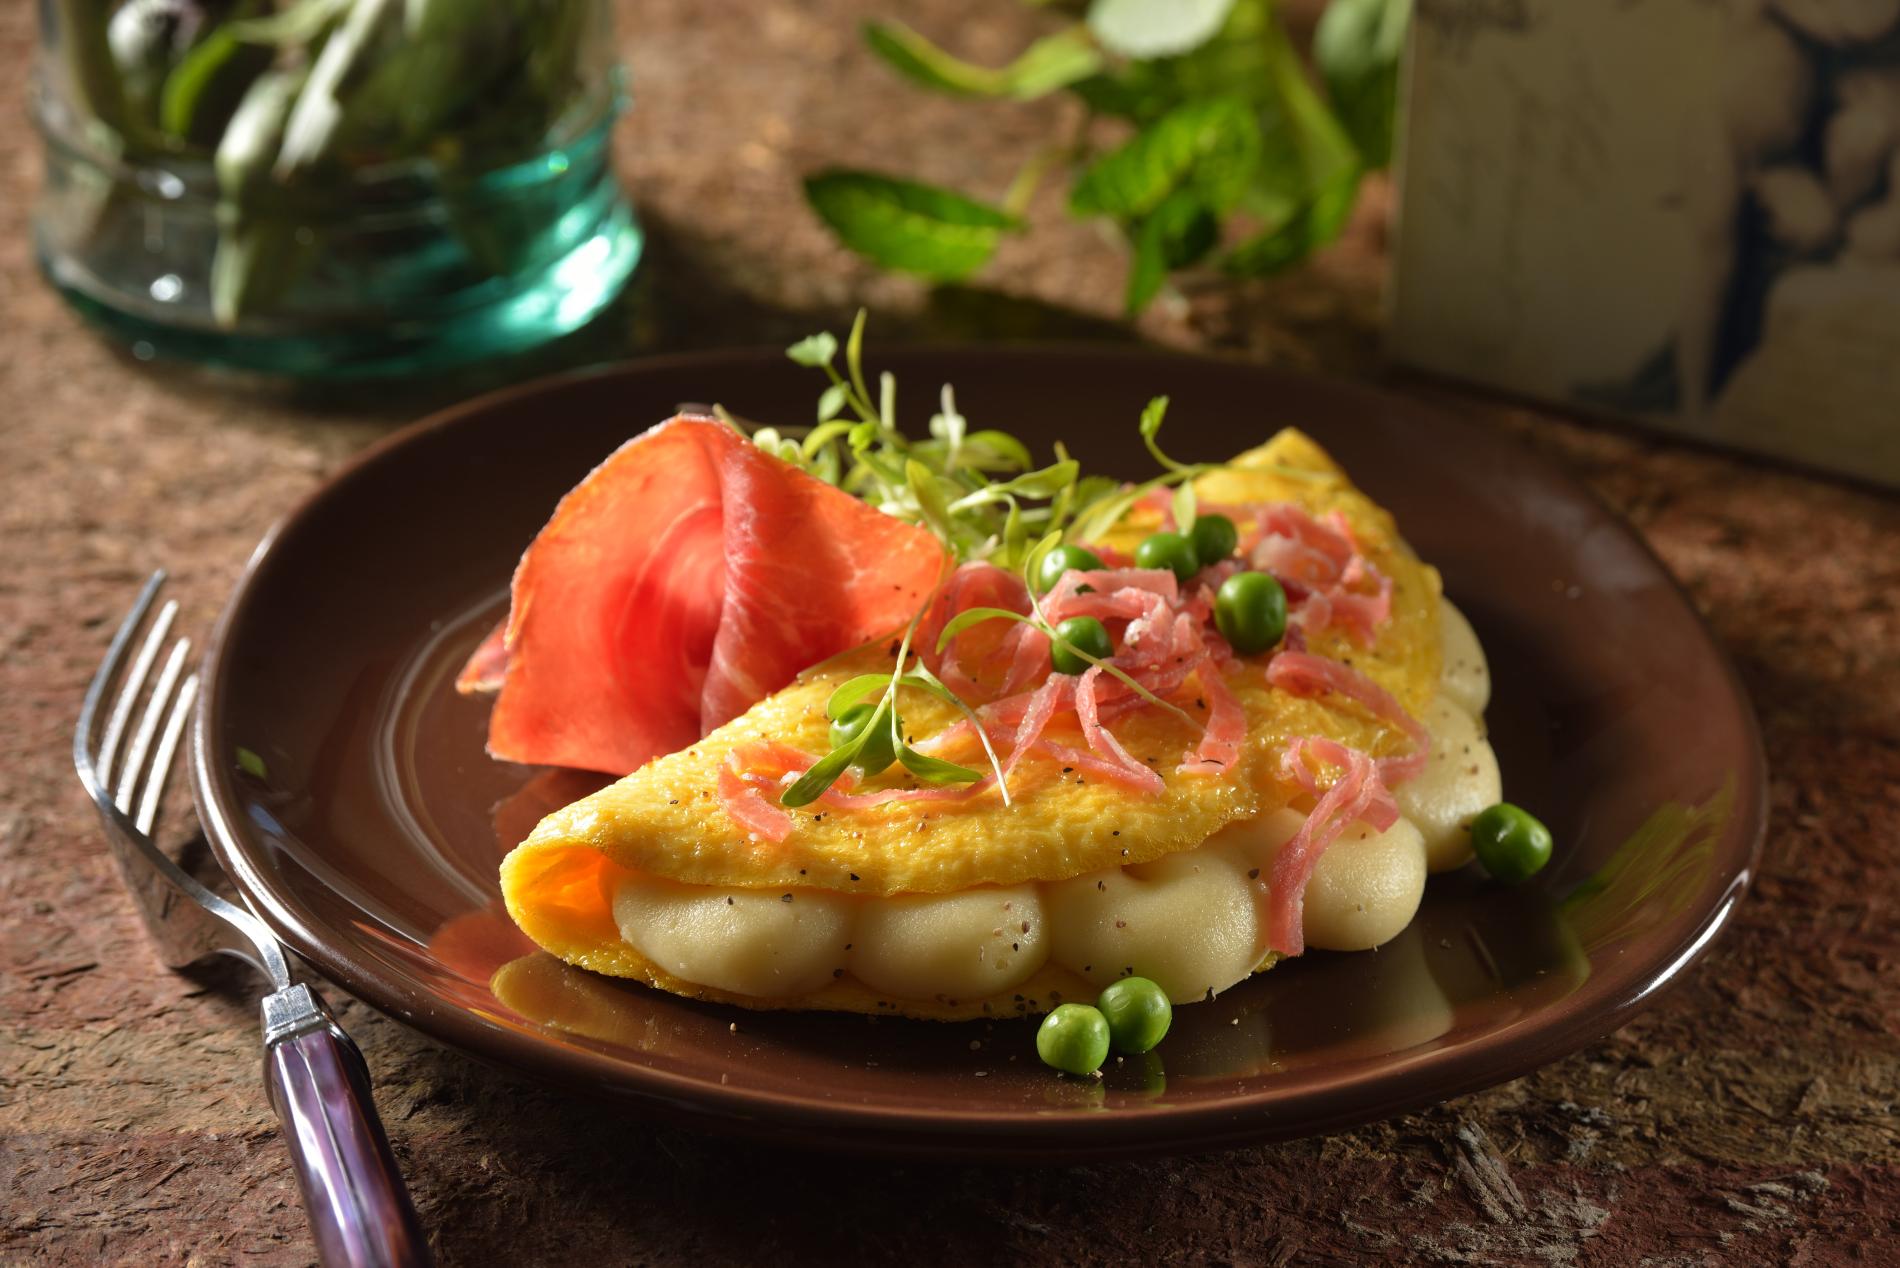 Omelette_con_puré_de_papa_y_jamón_serrano